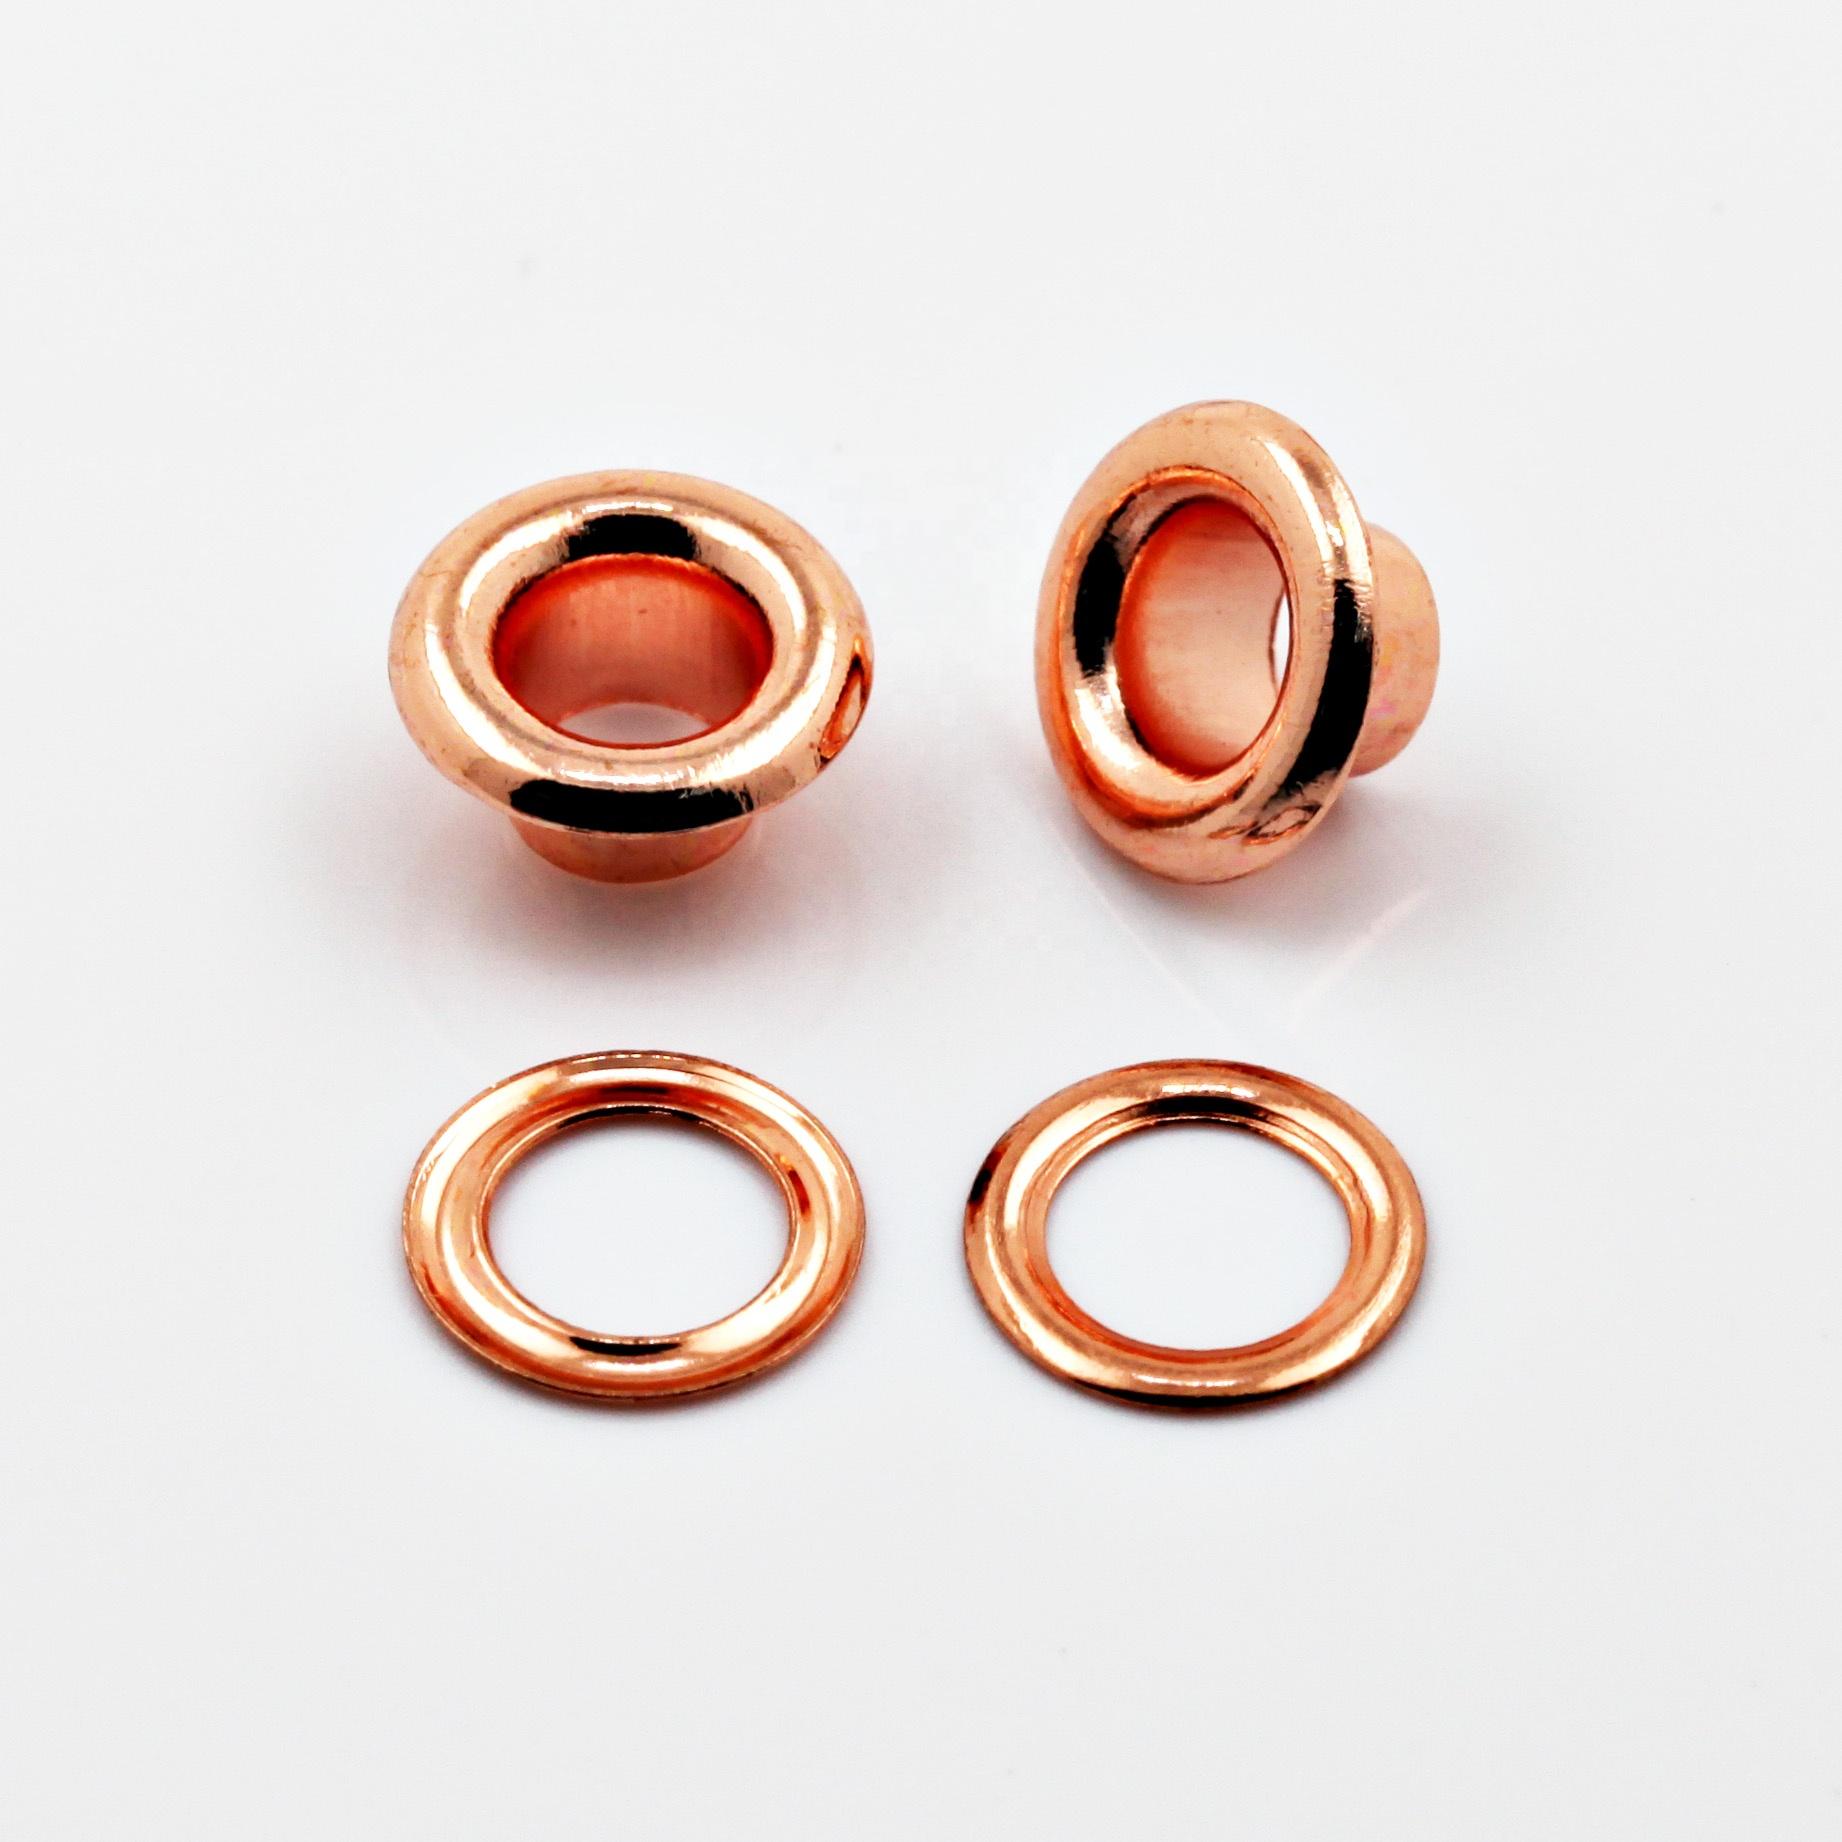 Hot Sale 14mm Decorative Metal Eyelets for Handbags Purses or Garments